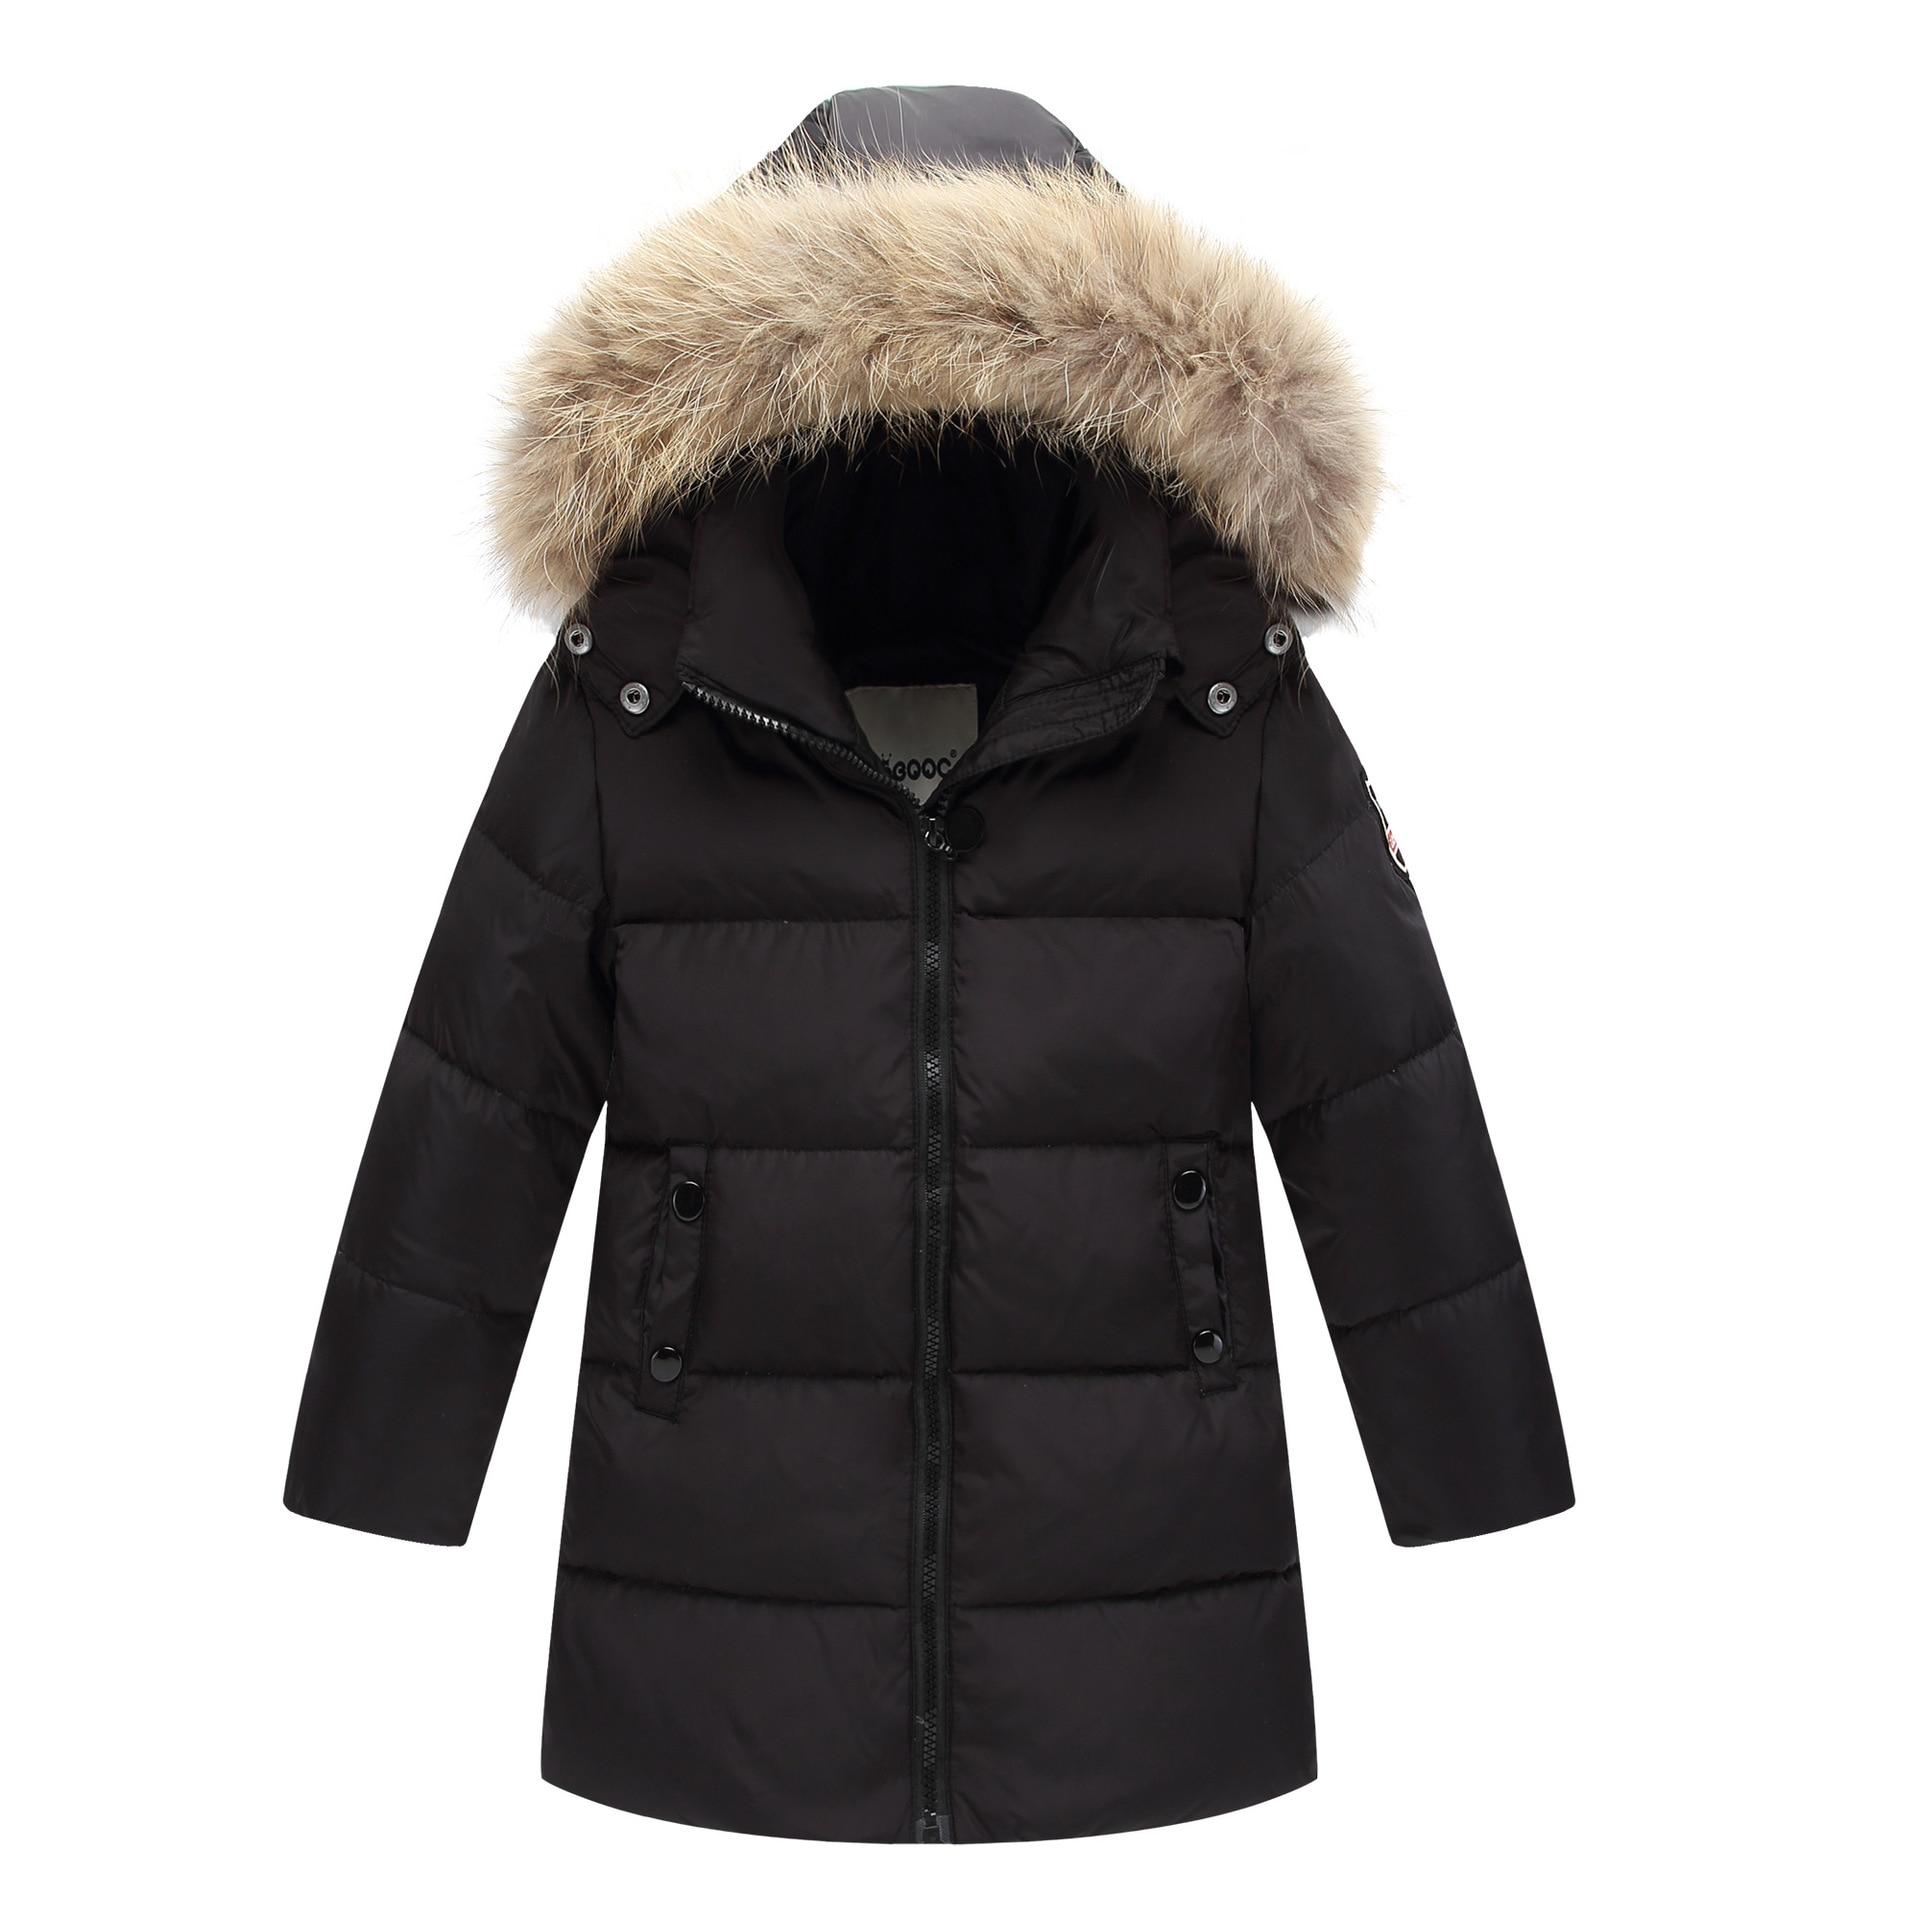 28626520f Hooded boys fur jackets thicken down   parkas children winter down ...